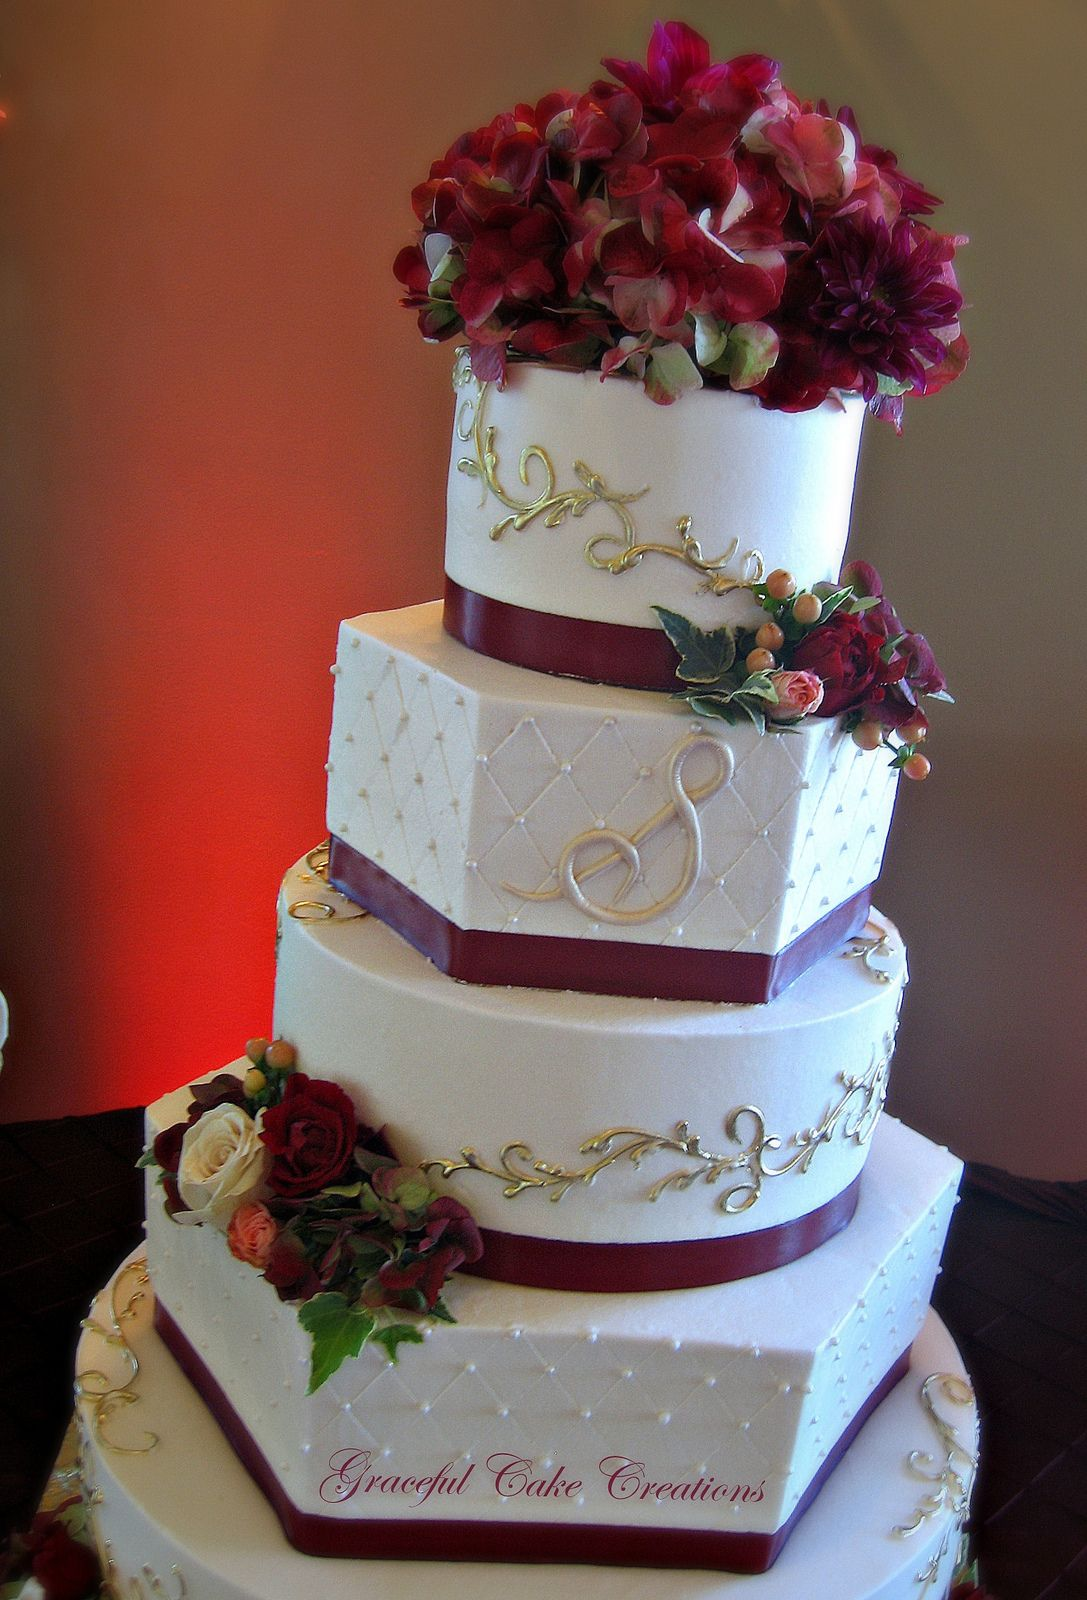 Elegant Ivory Buttercream Wedding Cake with Burgundy and